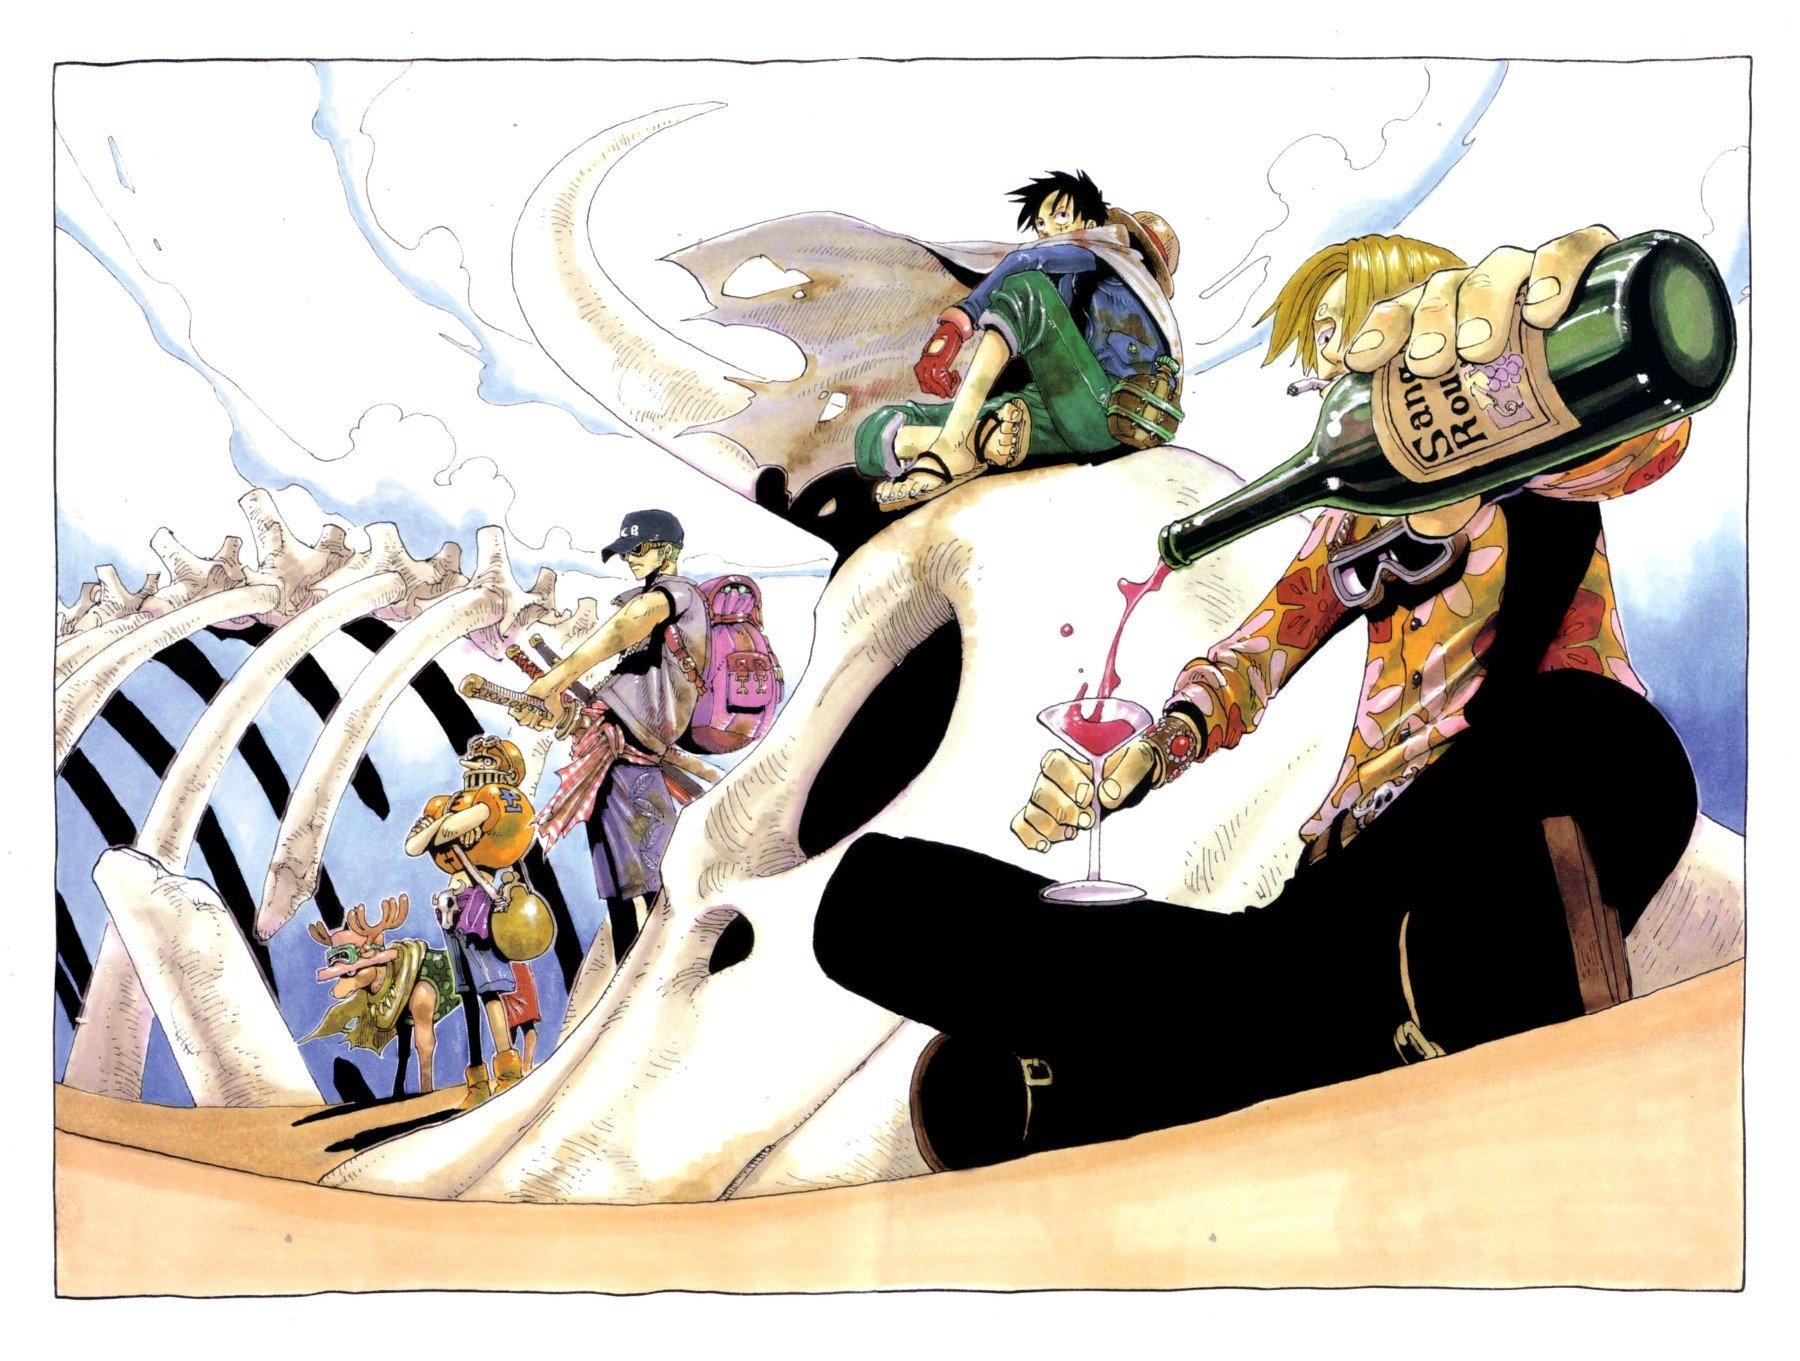 One Piece Sanji Monkey D Luffy Roronoa Zoro Usopp Tony Tony Chopper Hd Wallpapers Desktop And Mobile Images Photos